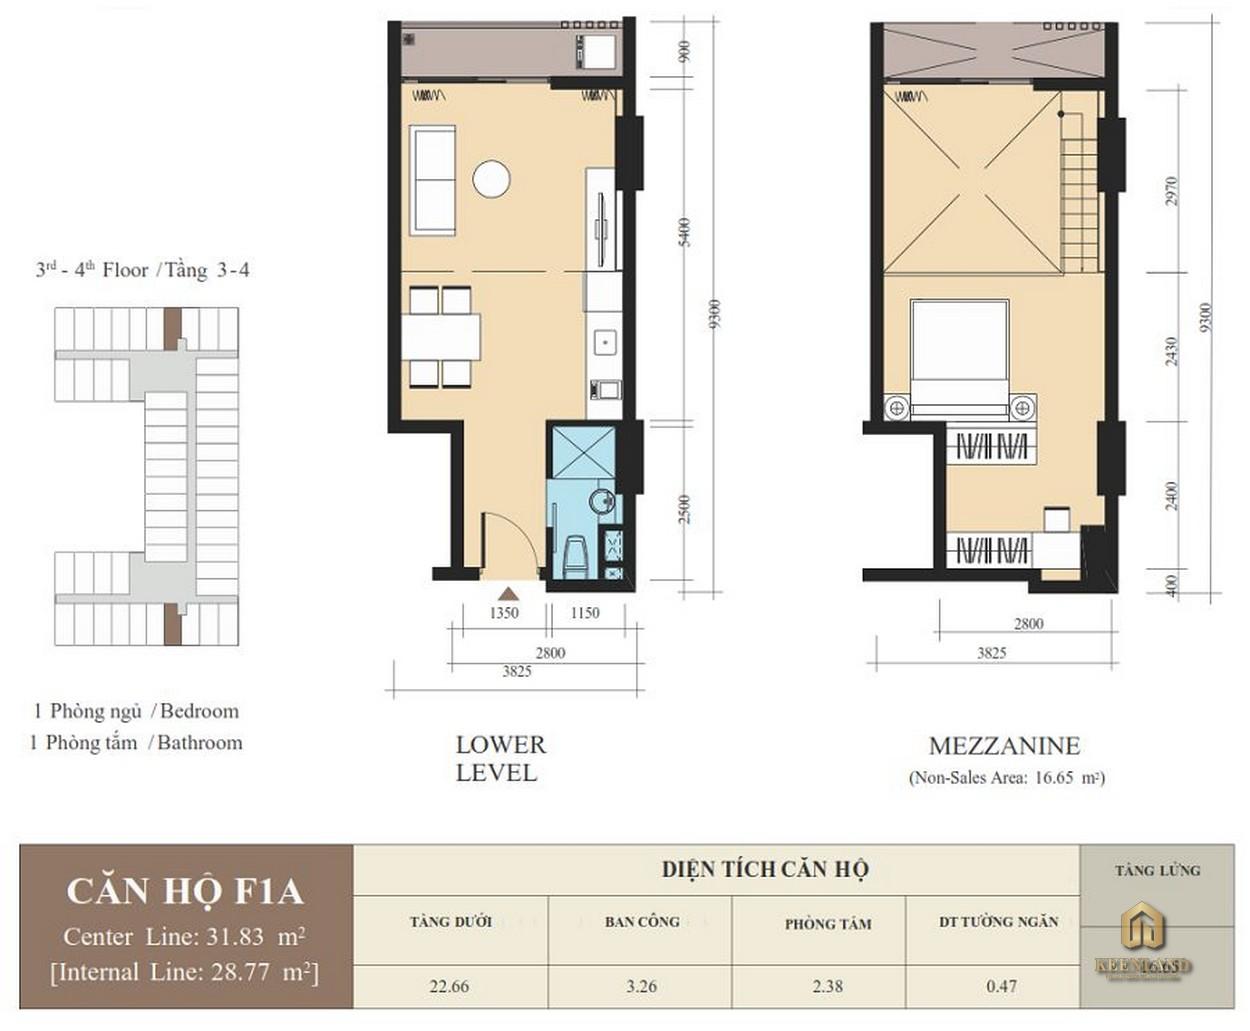 Thiết kế căn hộ F1A